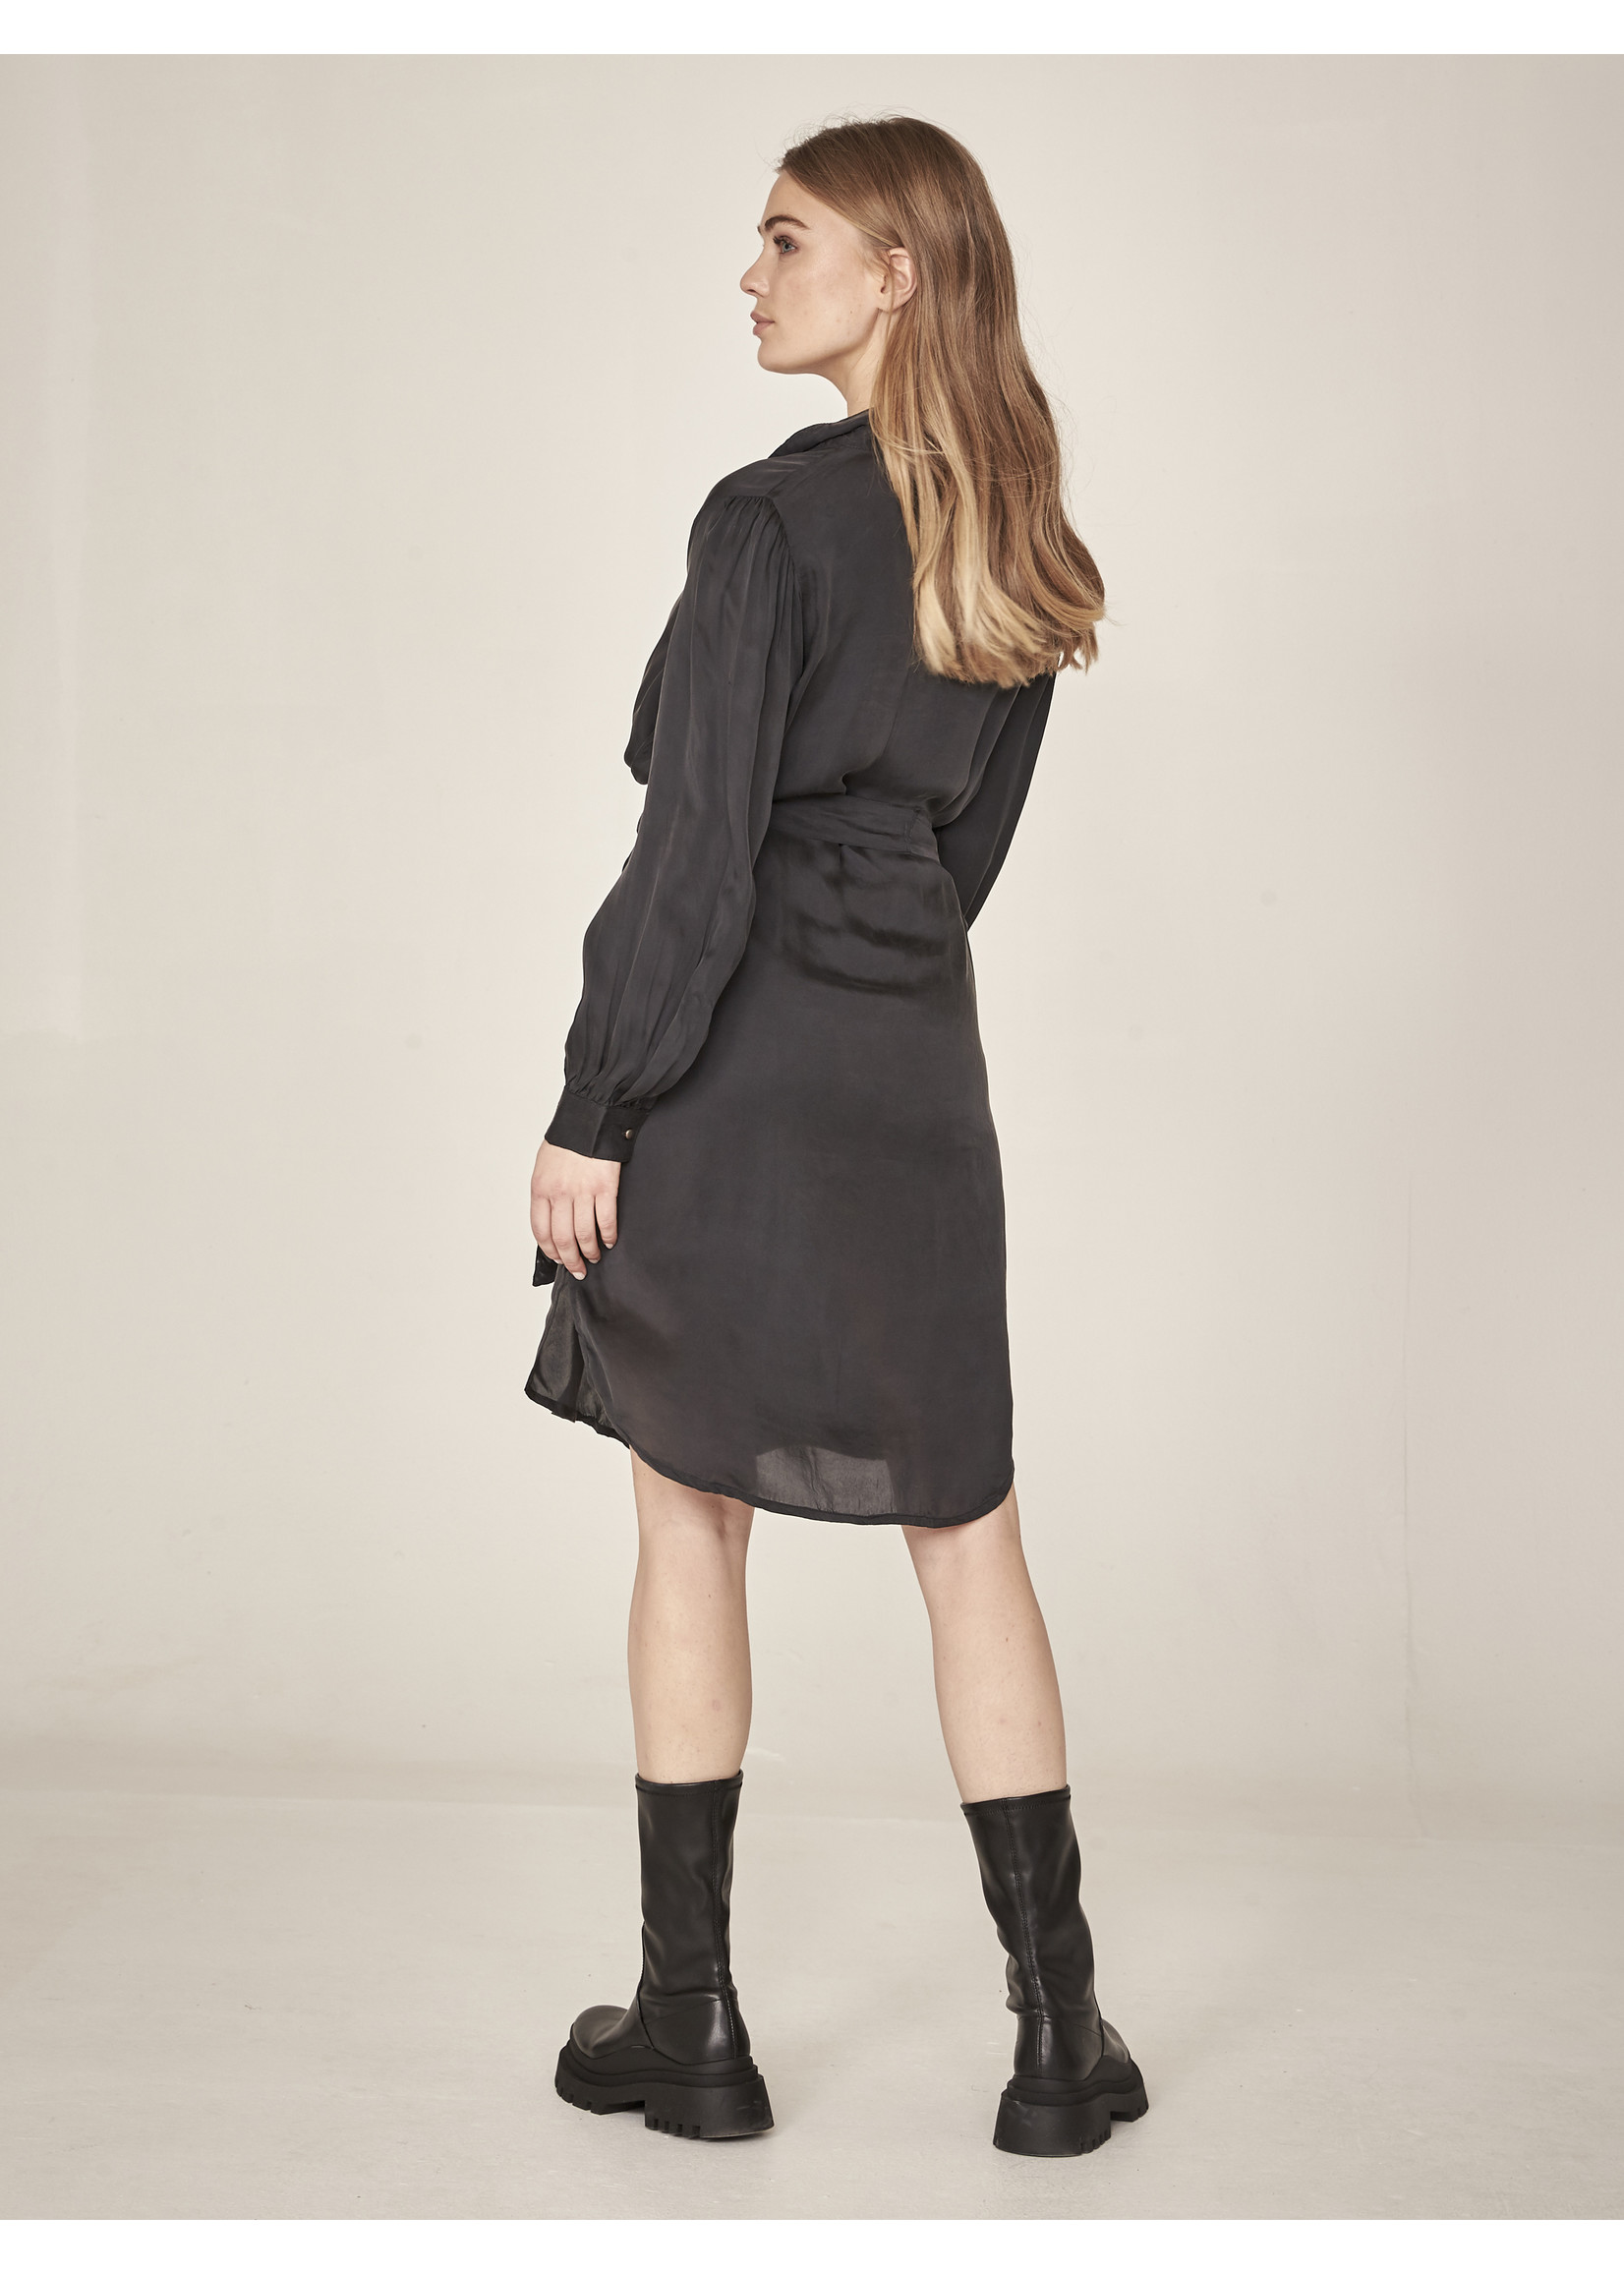 NÜ Inna Dress